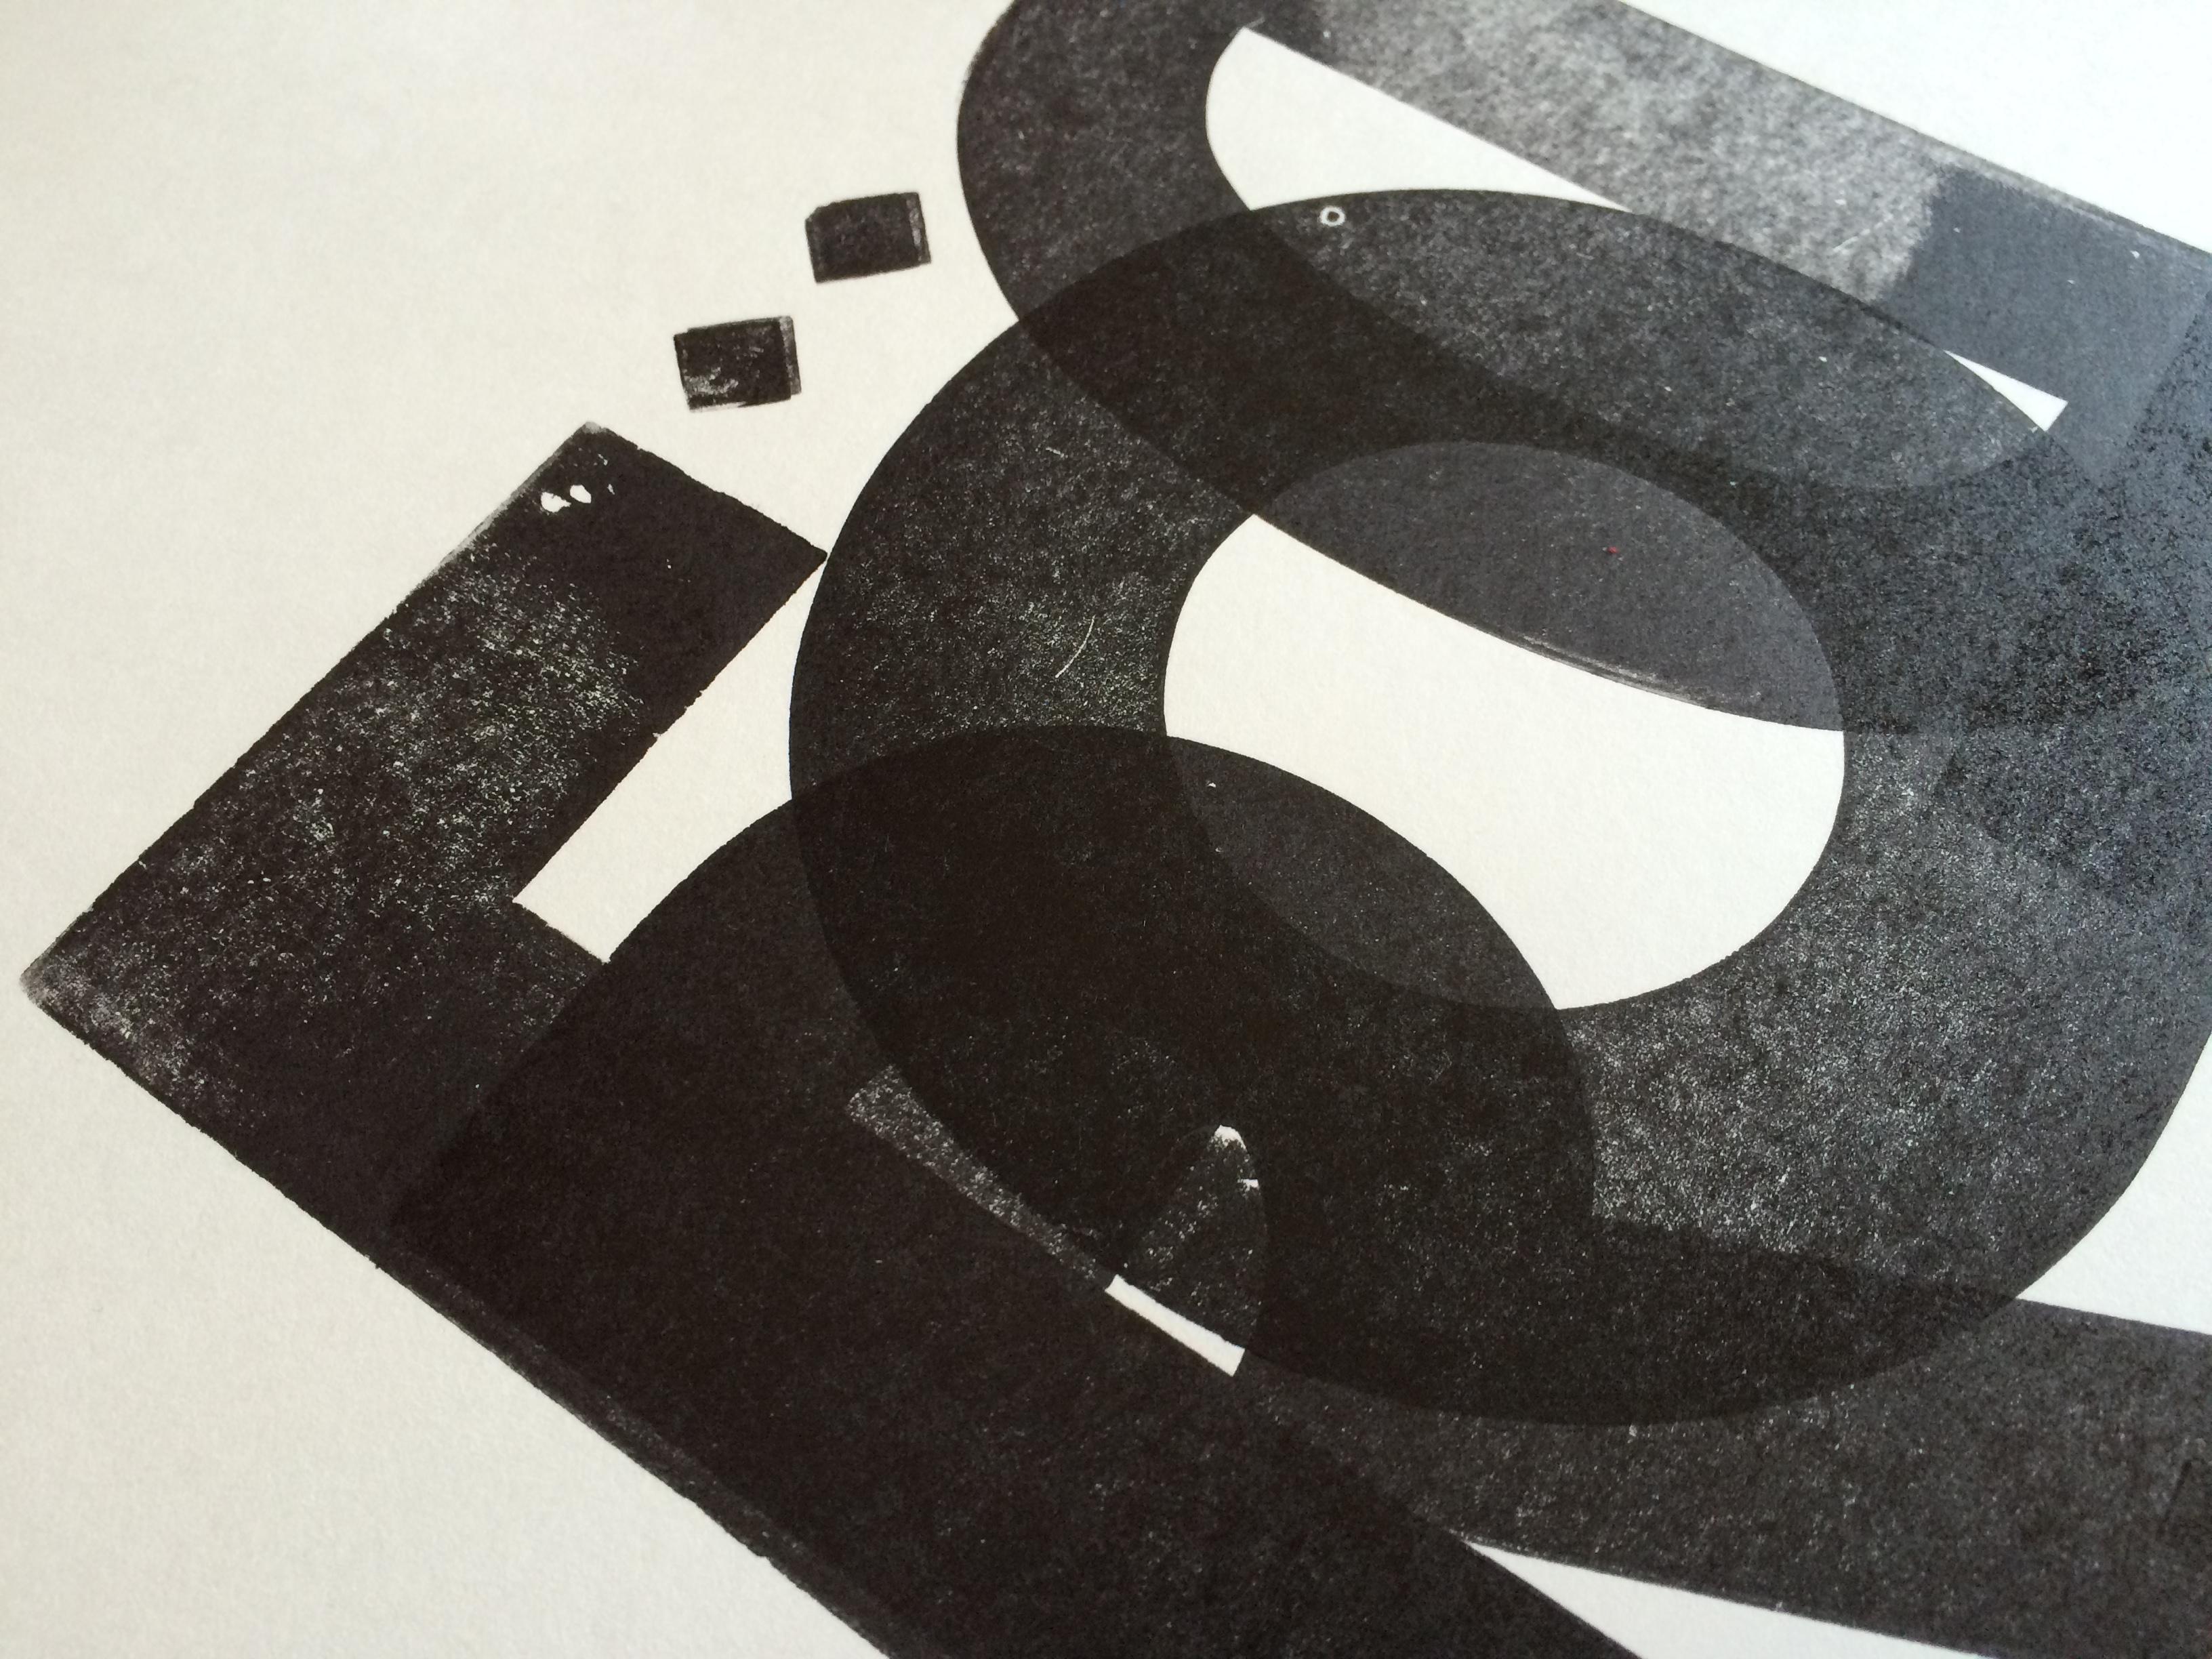 (sneak peak of   letterpress  printed page for the LpW book)